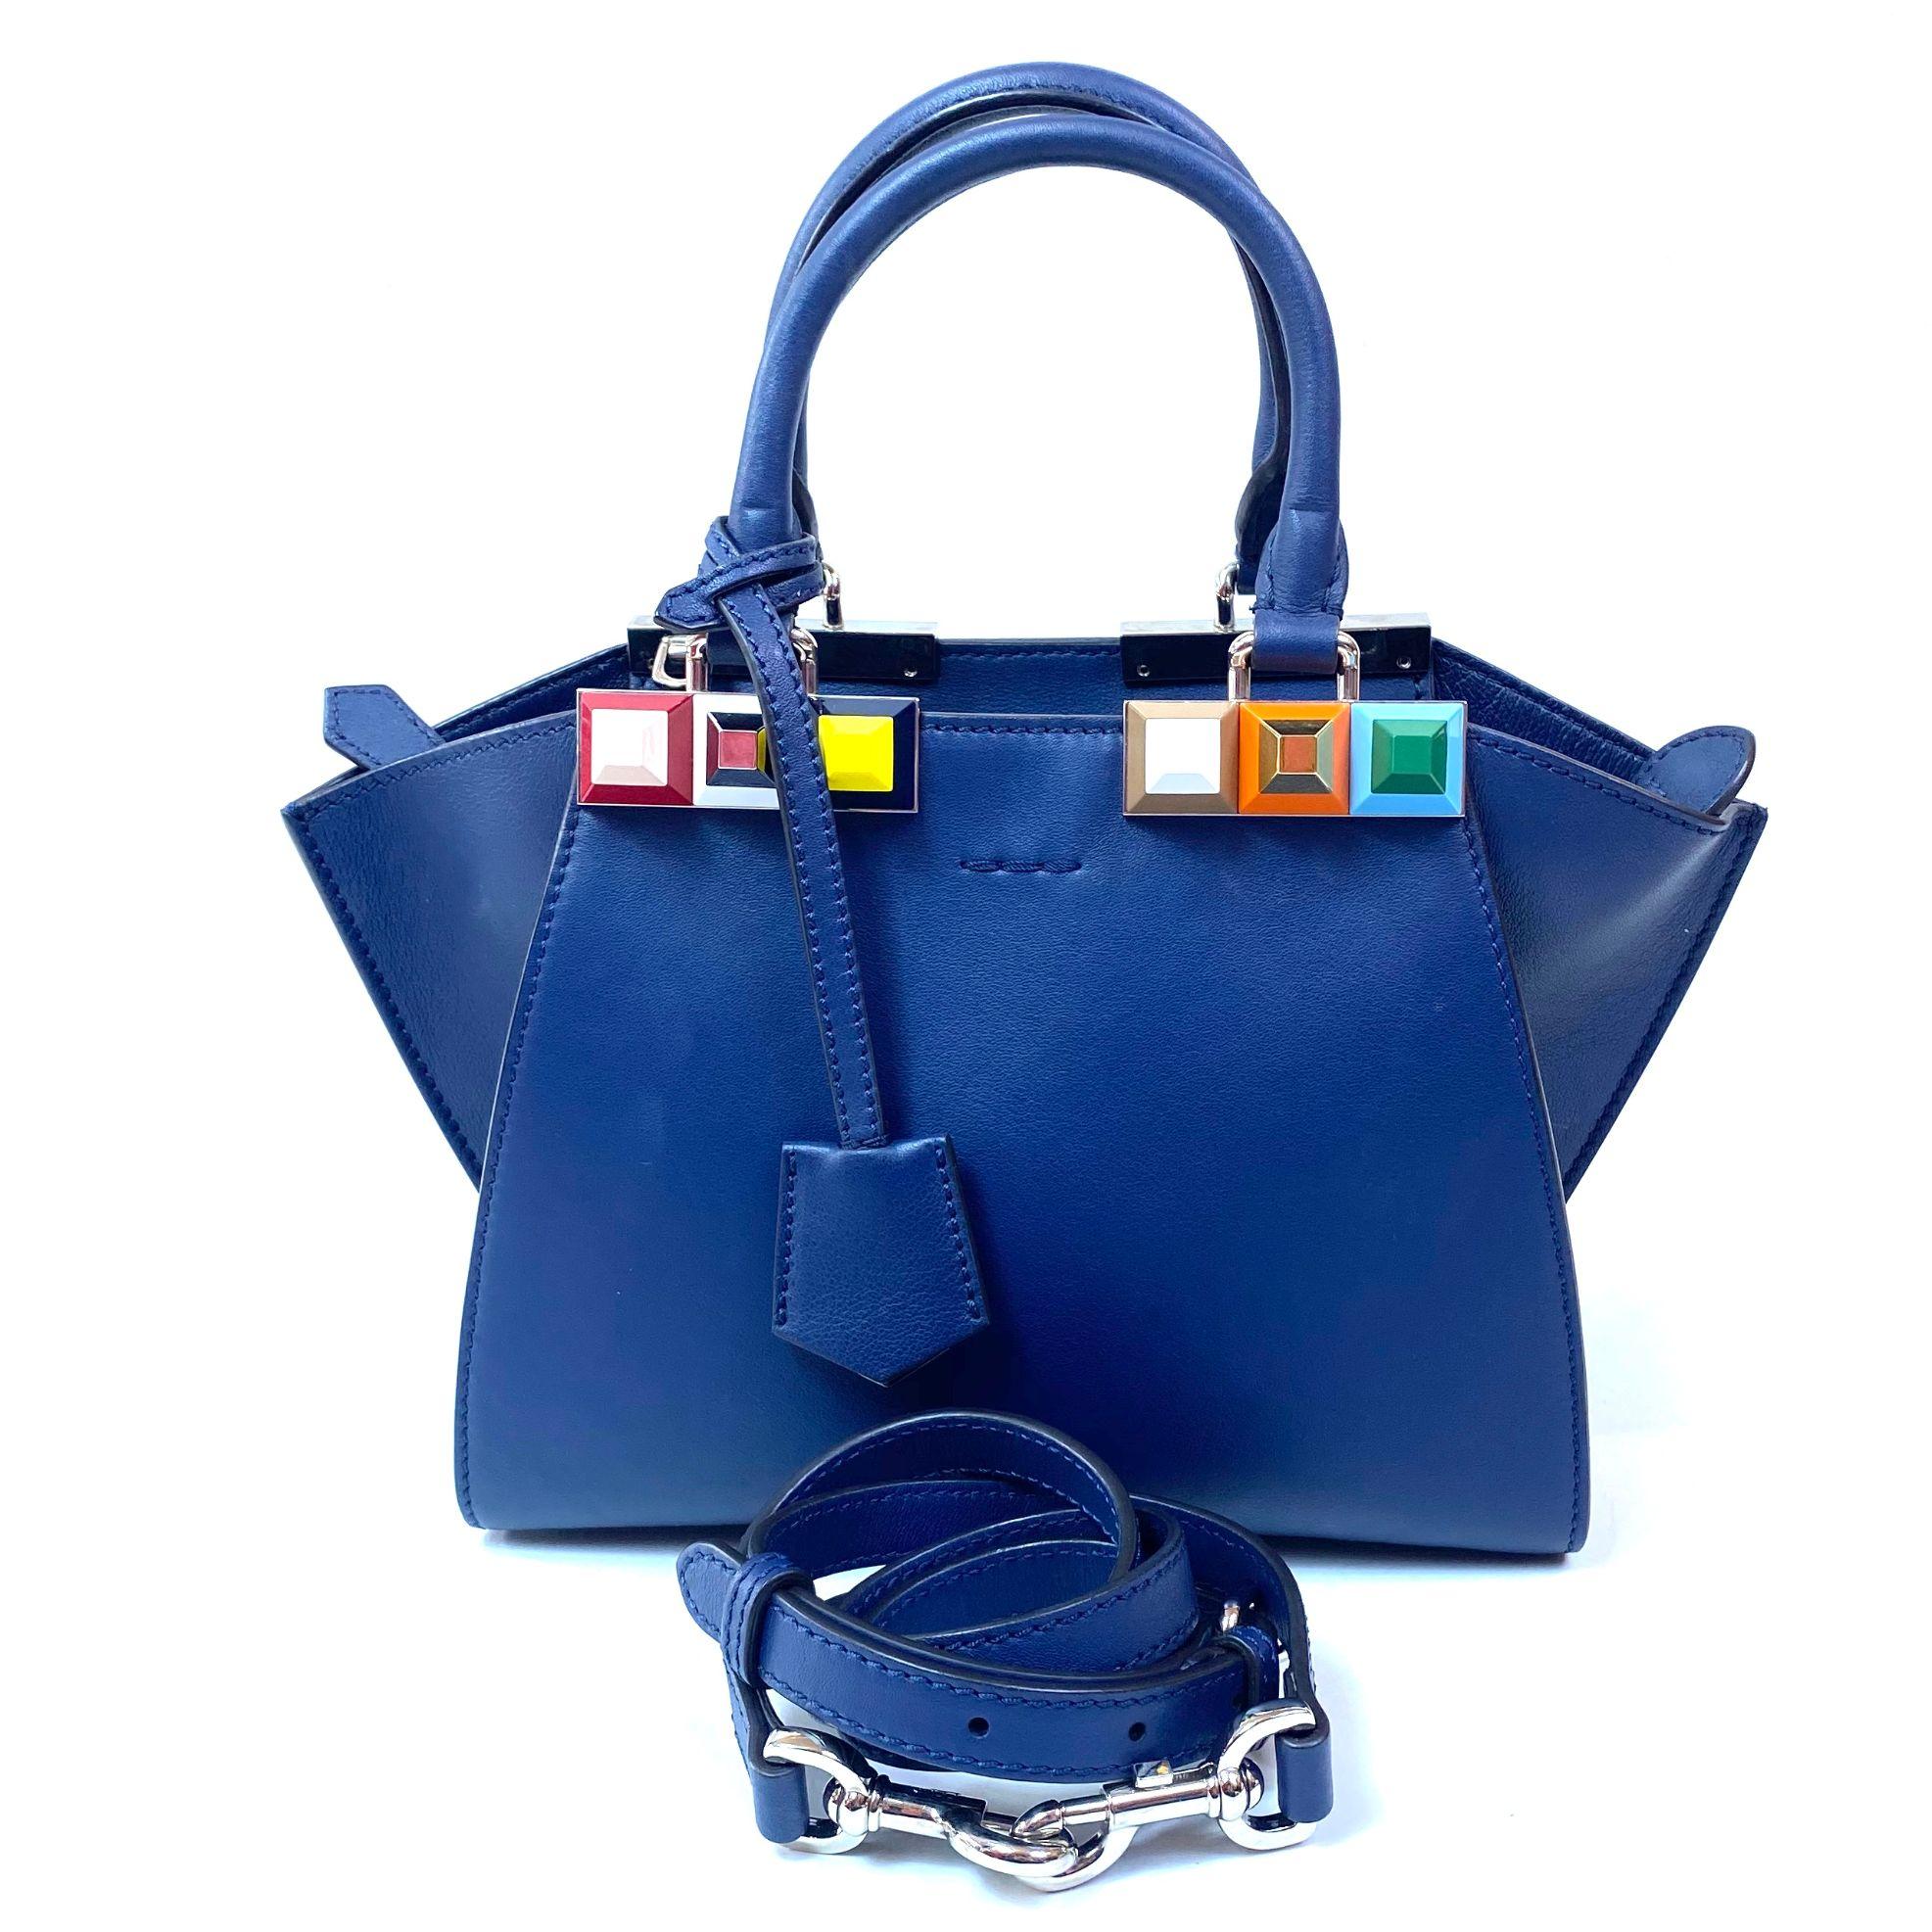 Bolsa Fendi 3Jours Azul